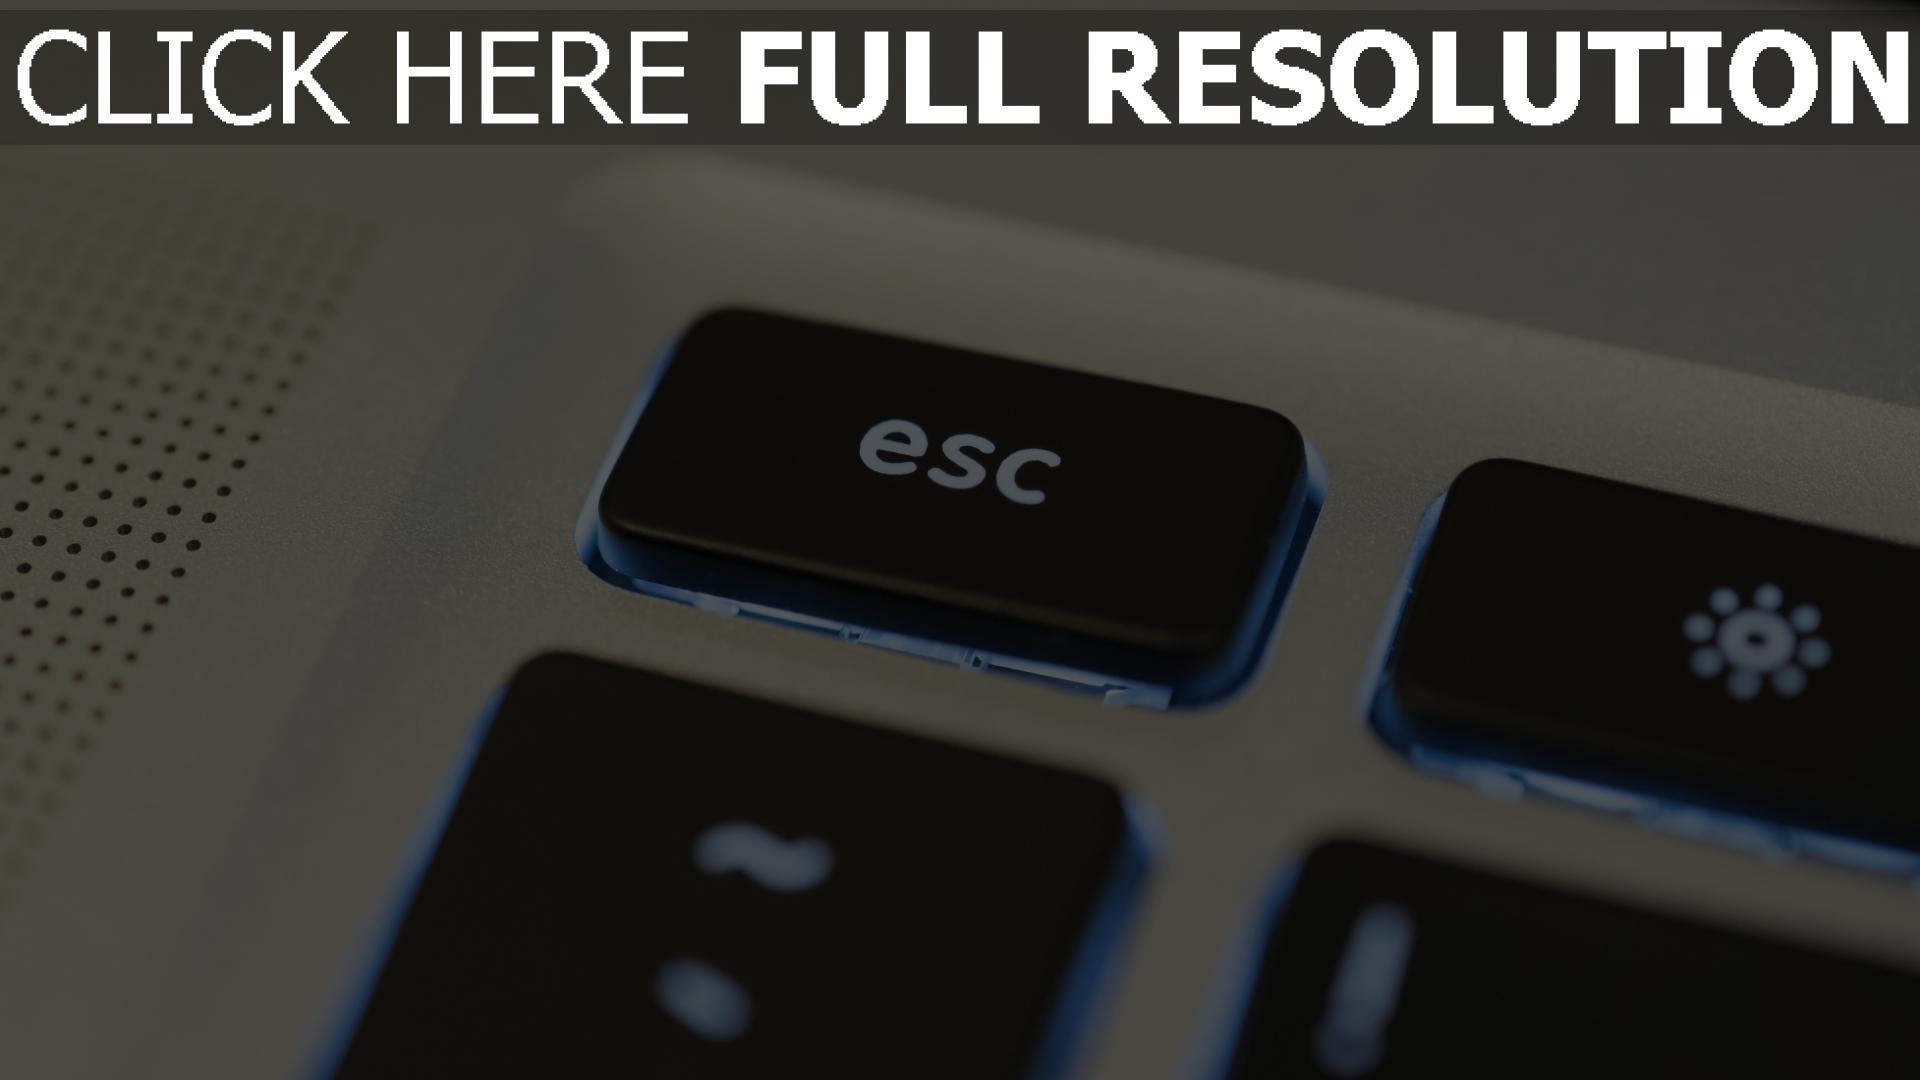 hd hintergrundbilder tastatur esc hintergrundbeleuchtung 1920x1080